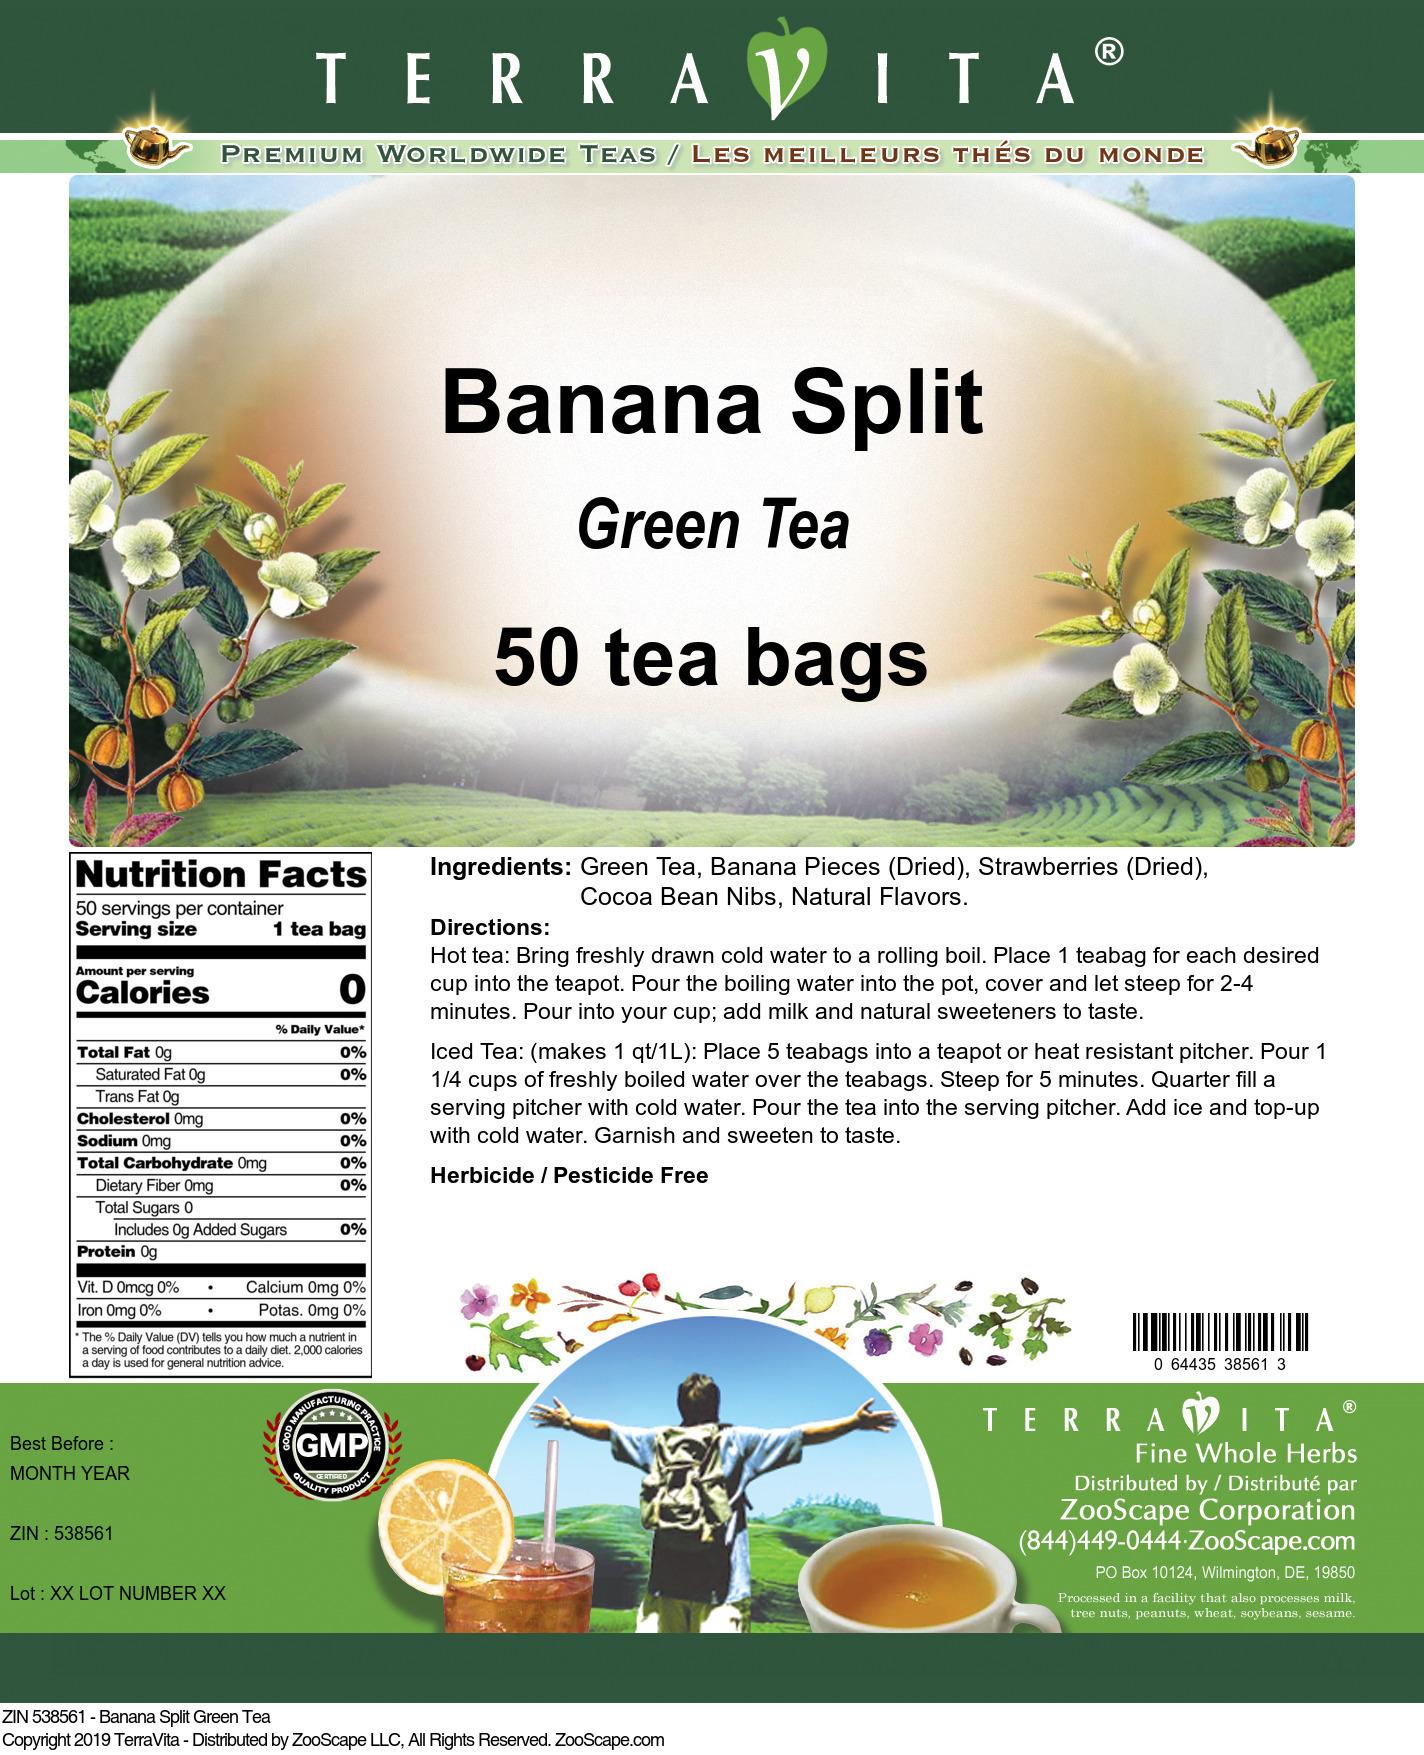 Banana Split Green Tea